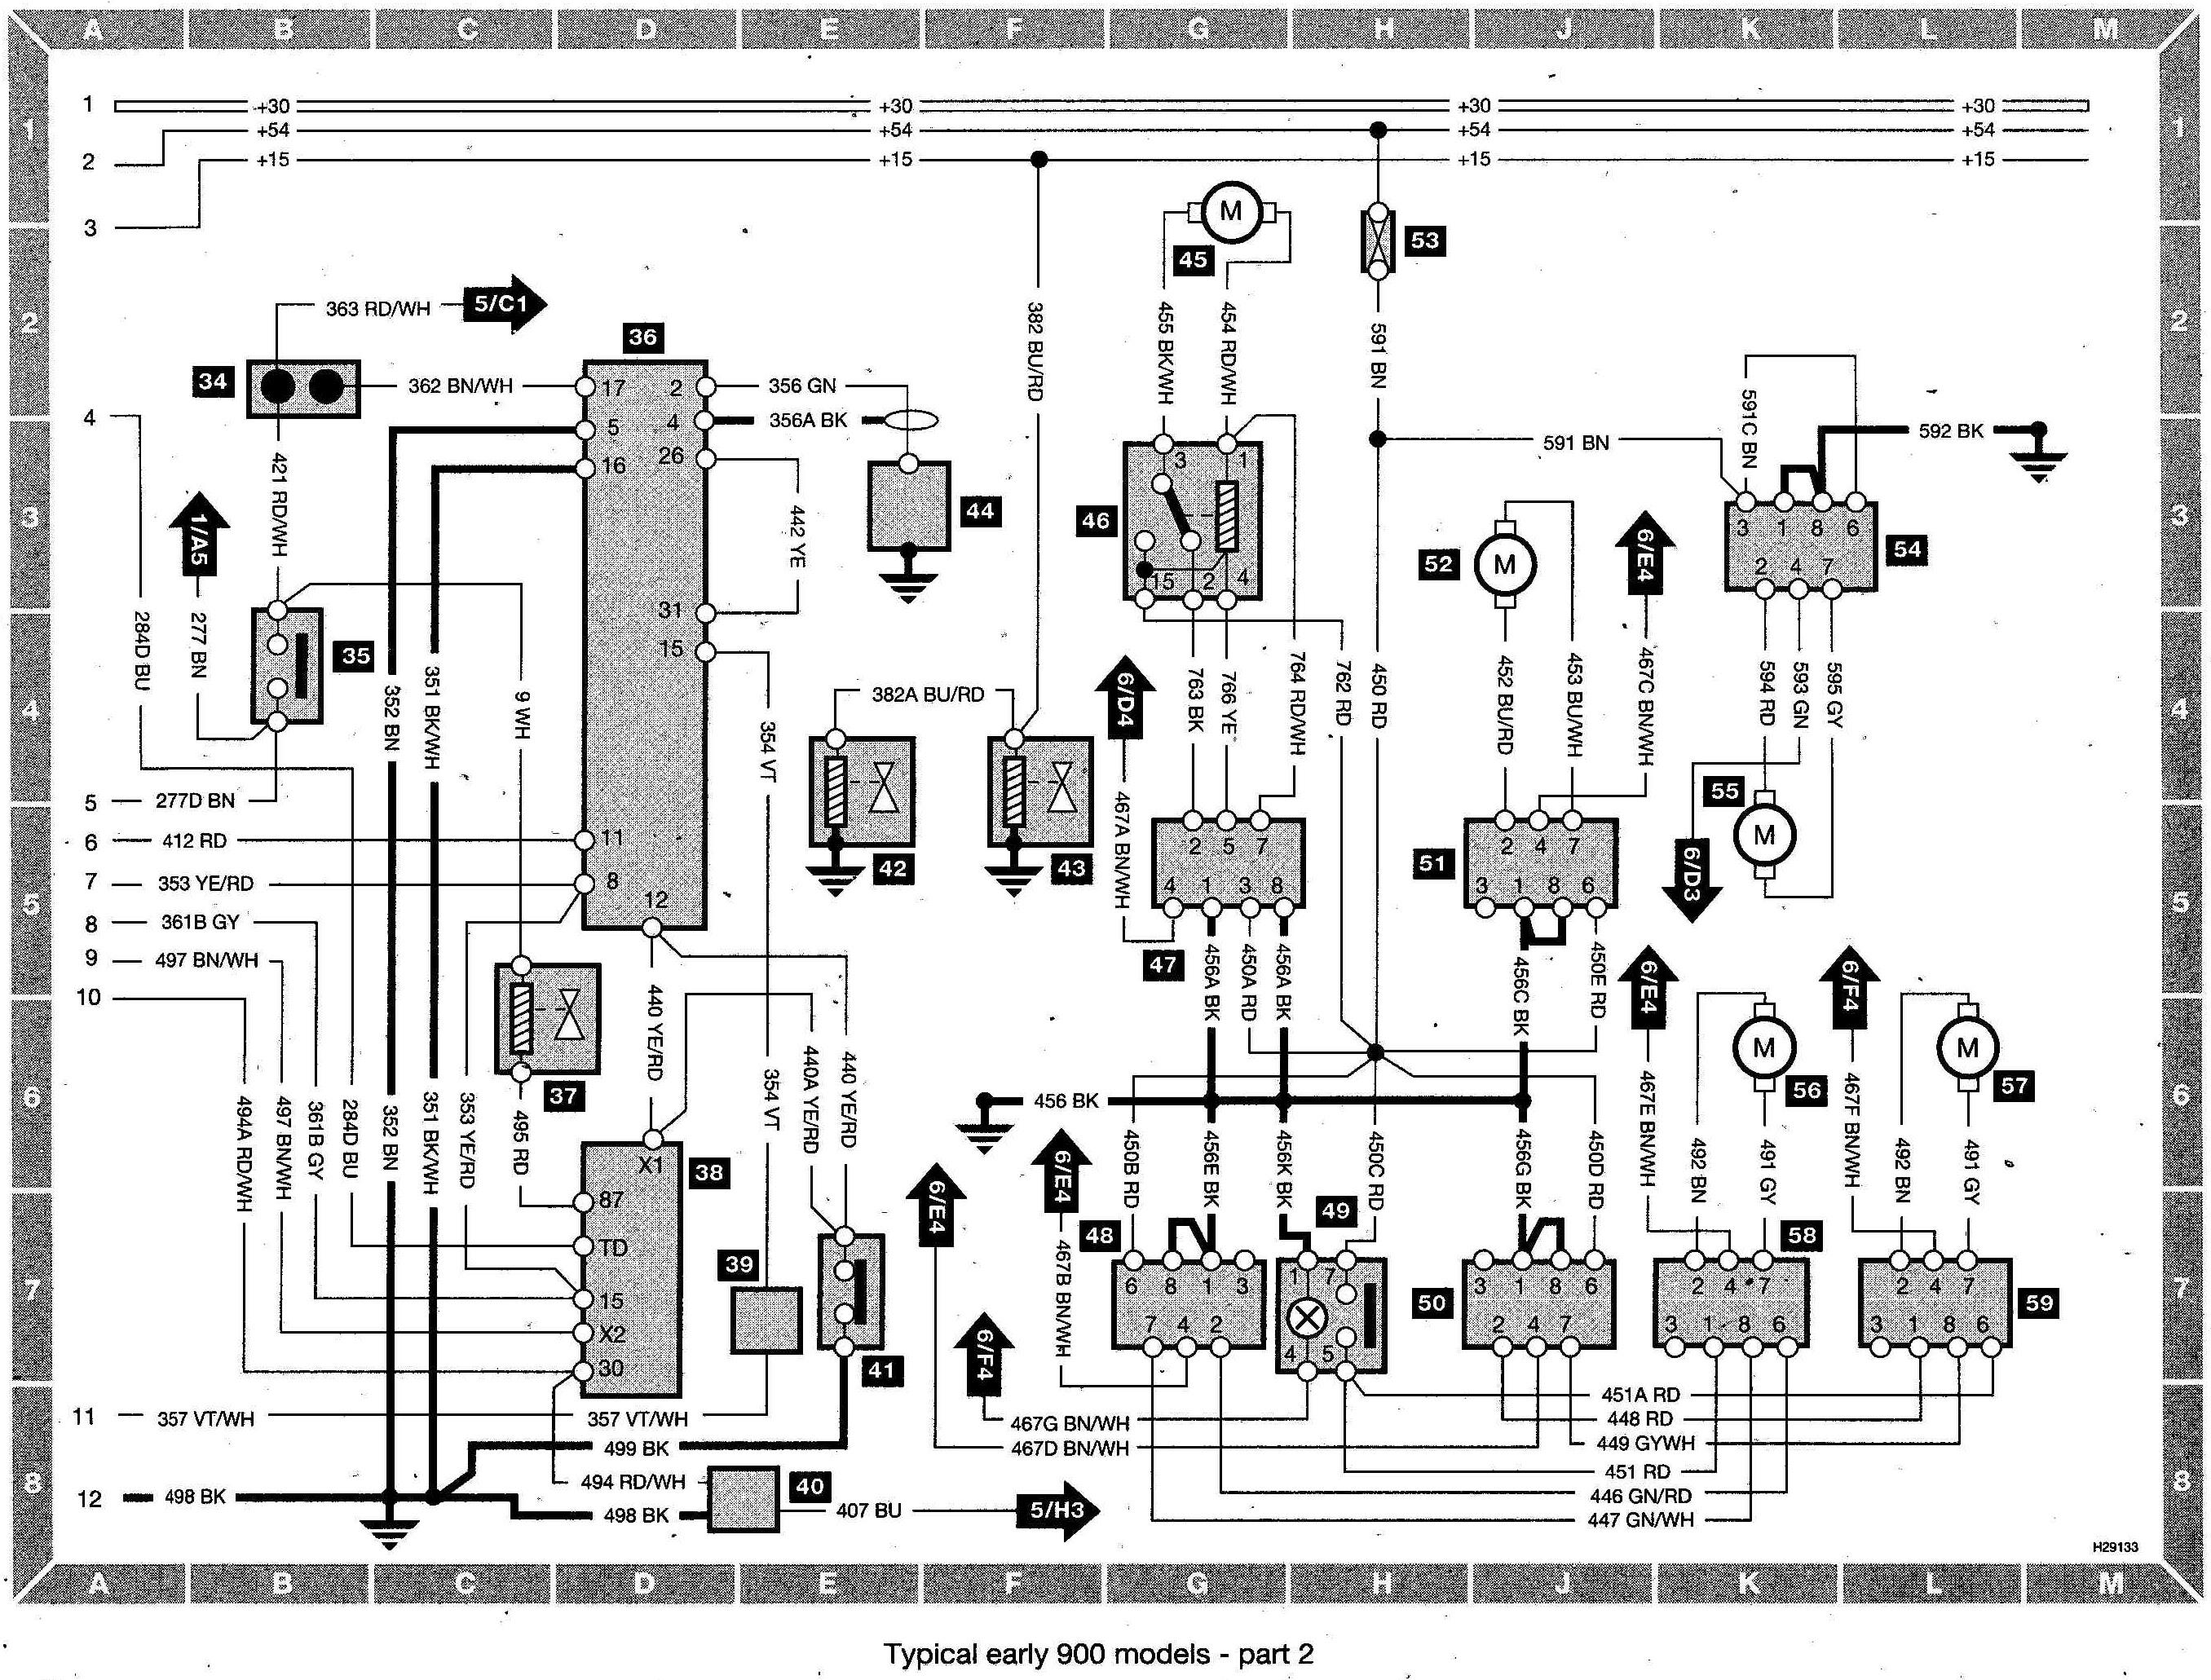 Fantastic Saab 9 5 Wiring Diagram Wiring Diagram Database Wiring Cloud Filiciilluminateatxorg